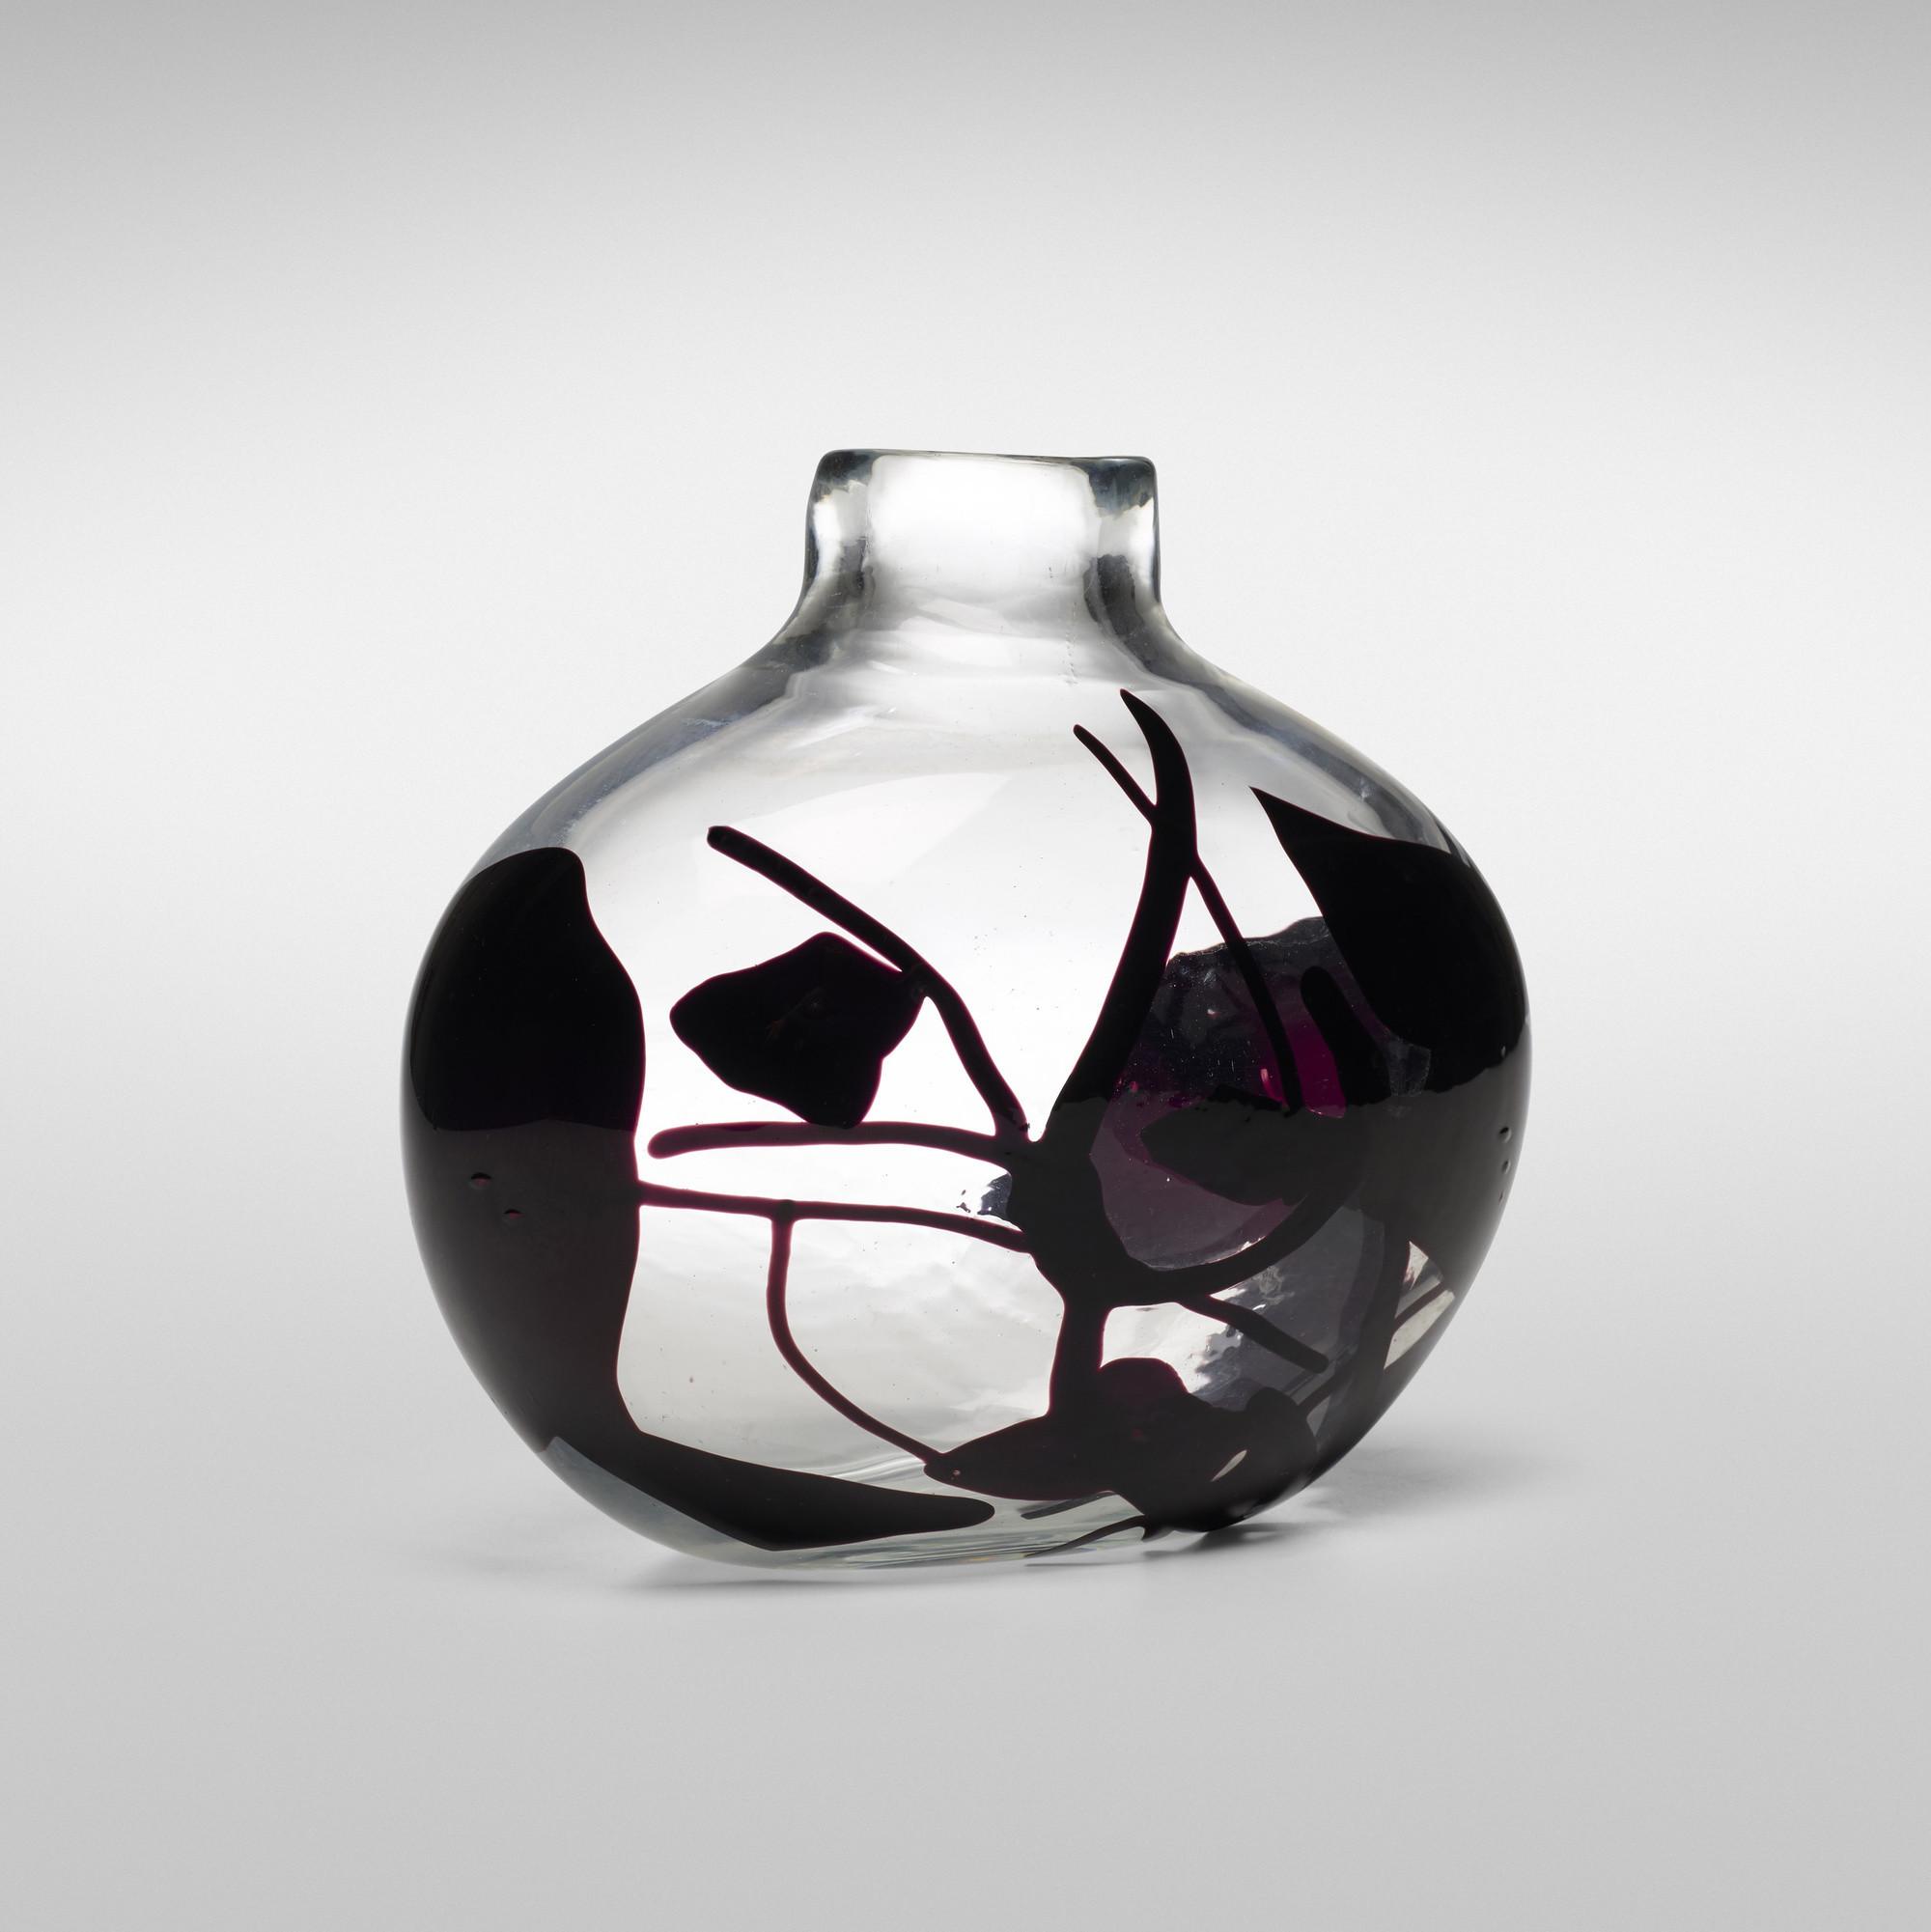 cheap red glass vases of 139 fulvio bianconi important con macchie vase model 4324 within 139 fulvio bianconi important con macchie vase model 4324 2 of 4